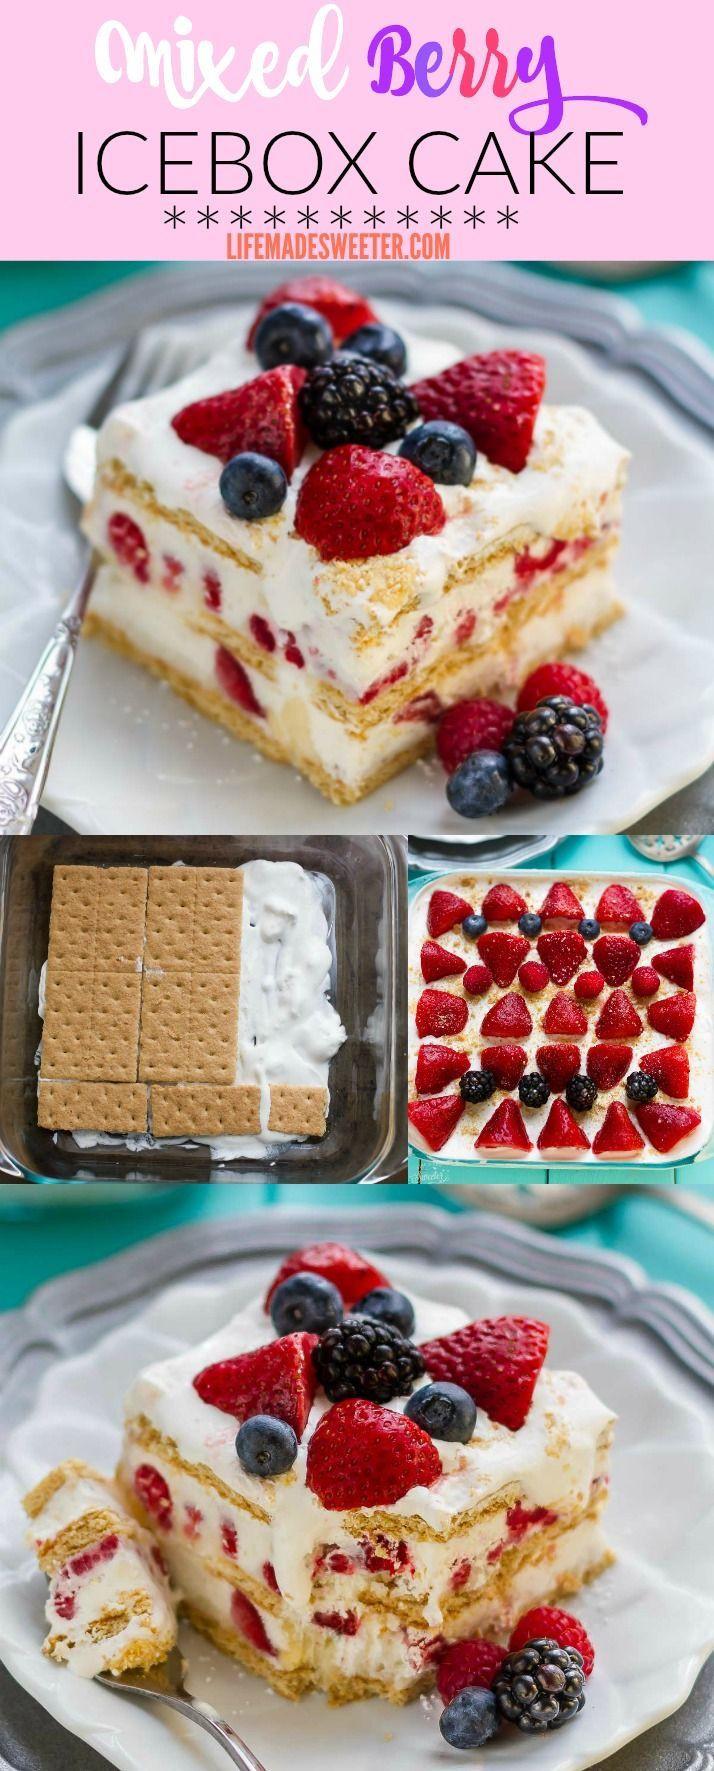 Great Summer Desserts  180 best Summertime images on Pinterest